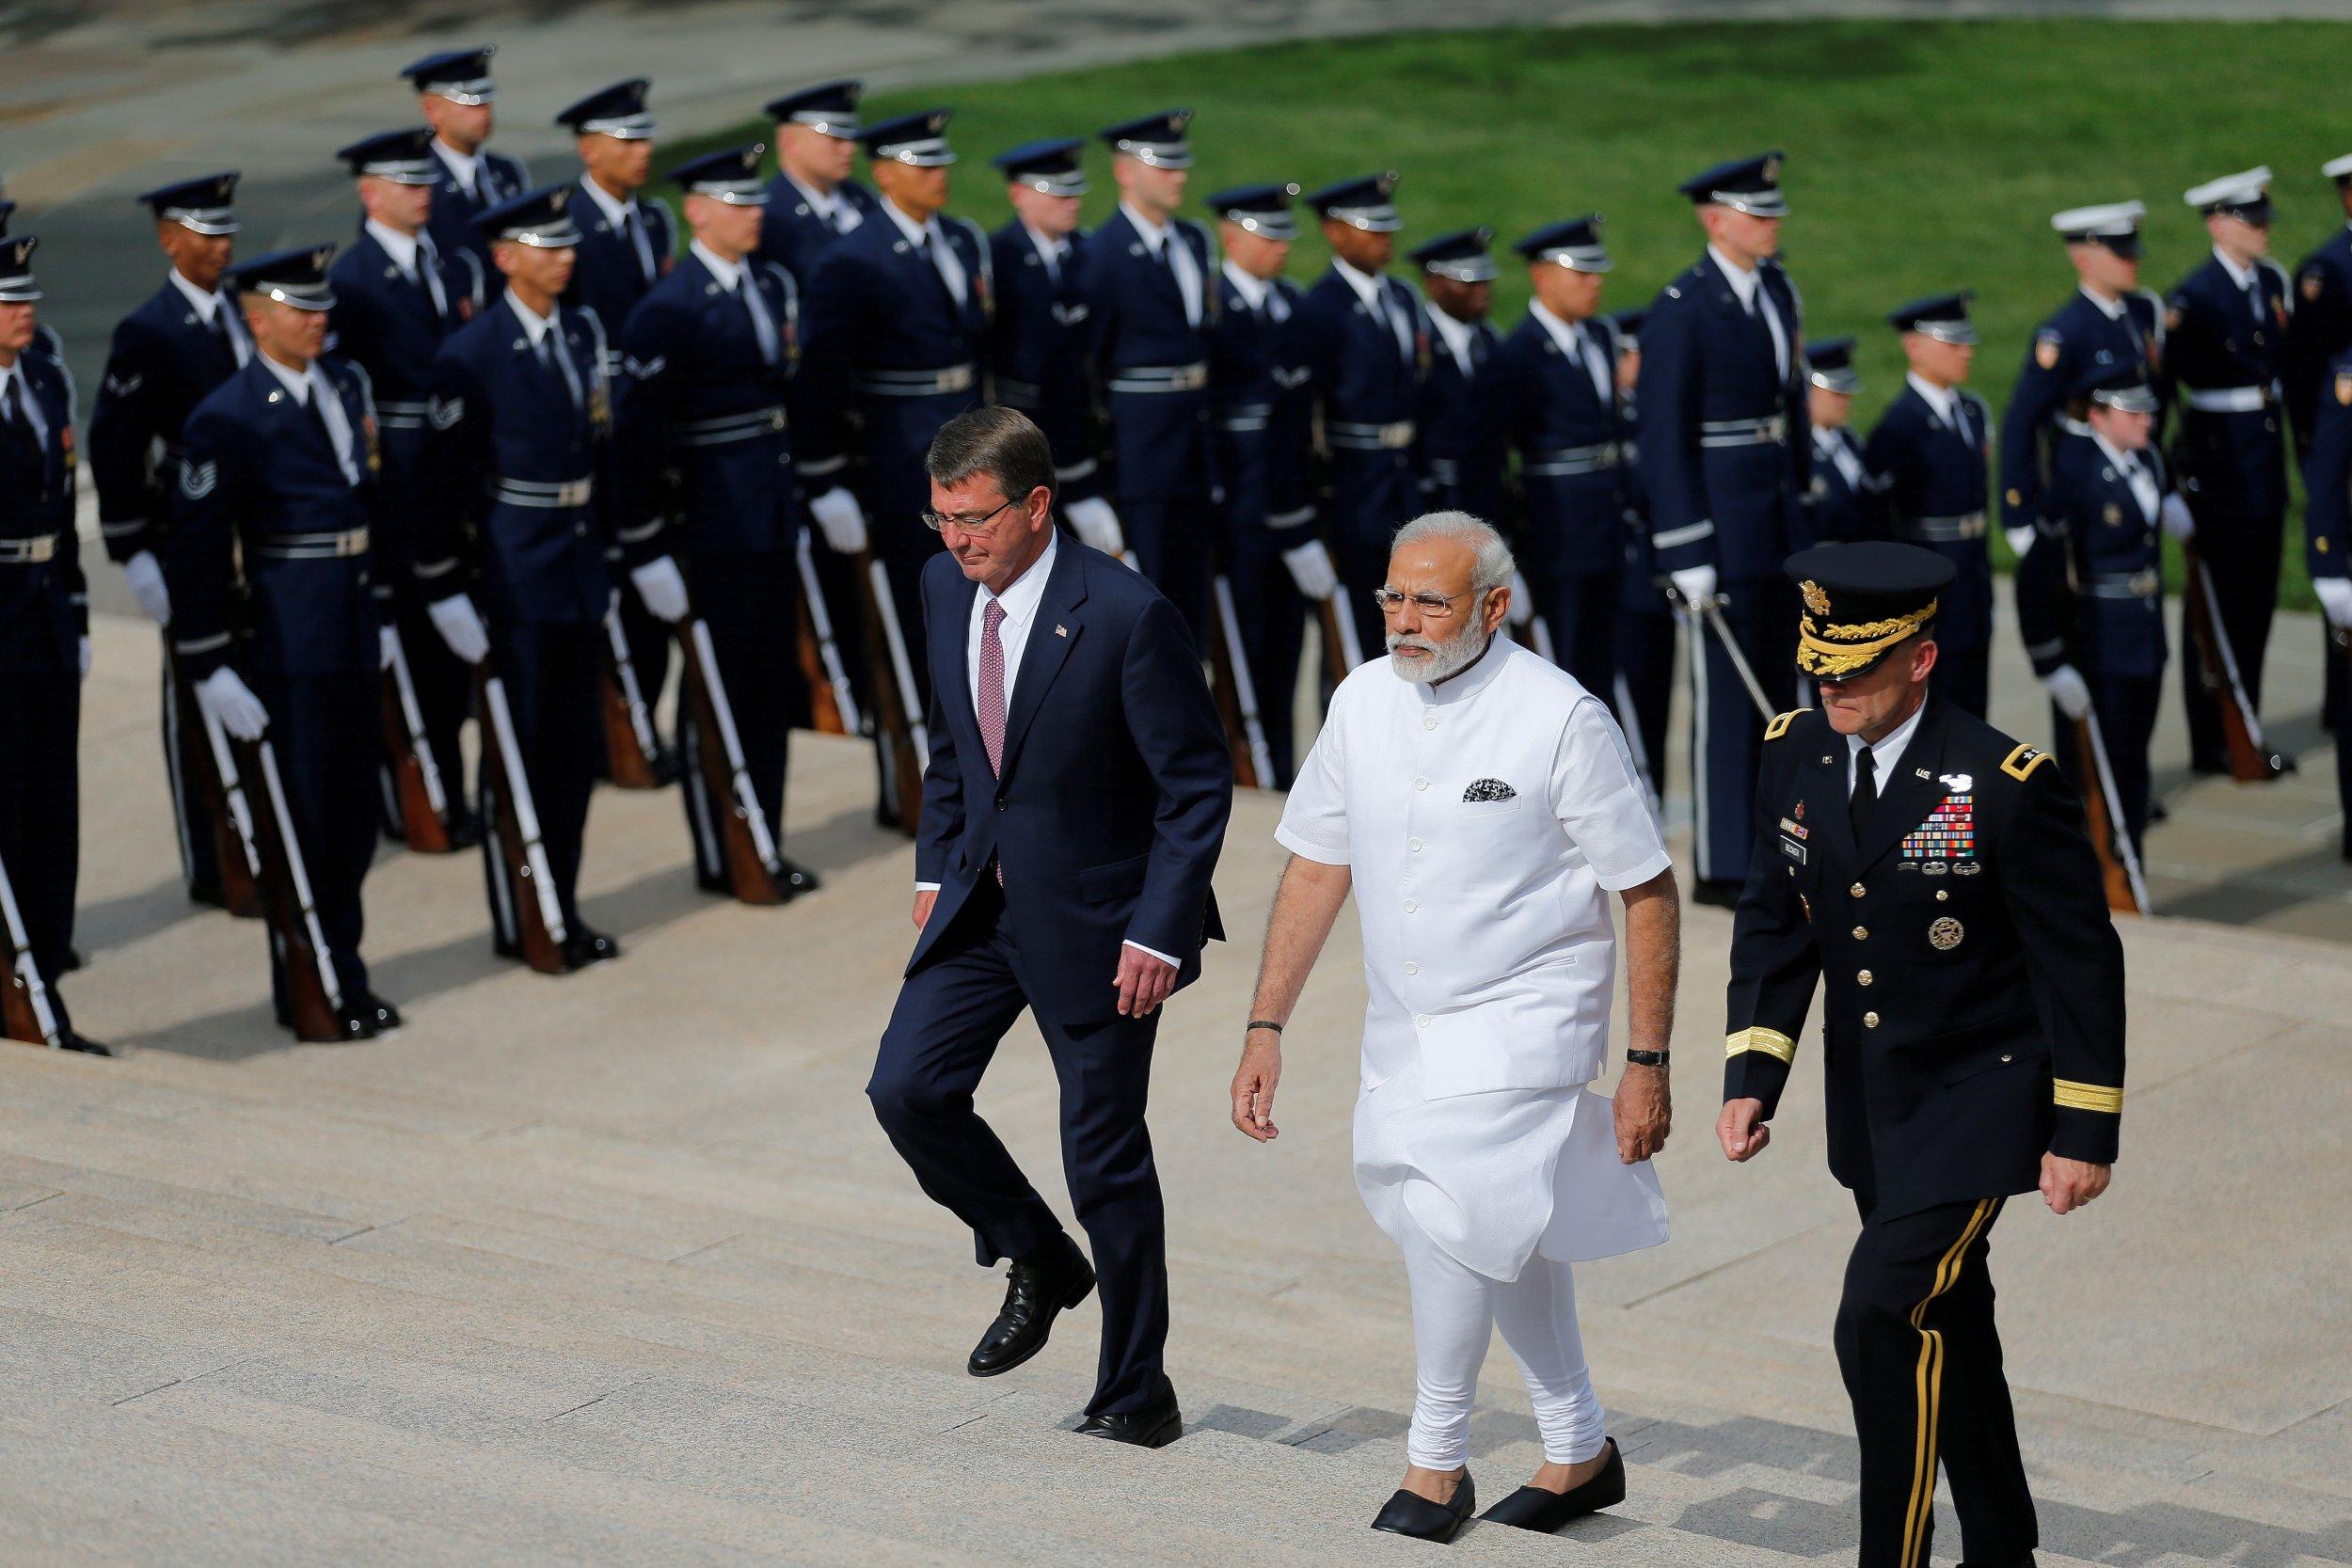 06_08_Modi_Intolerance_01